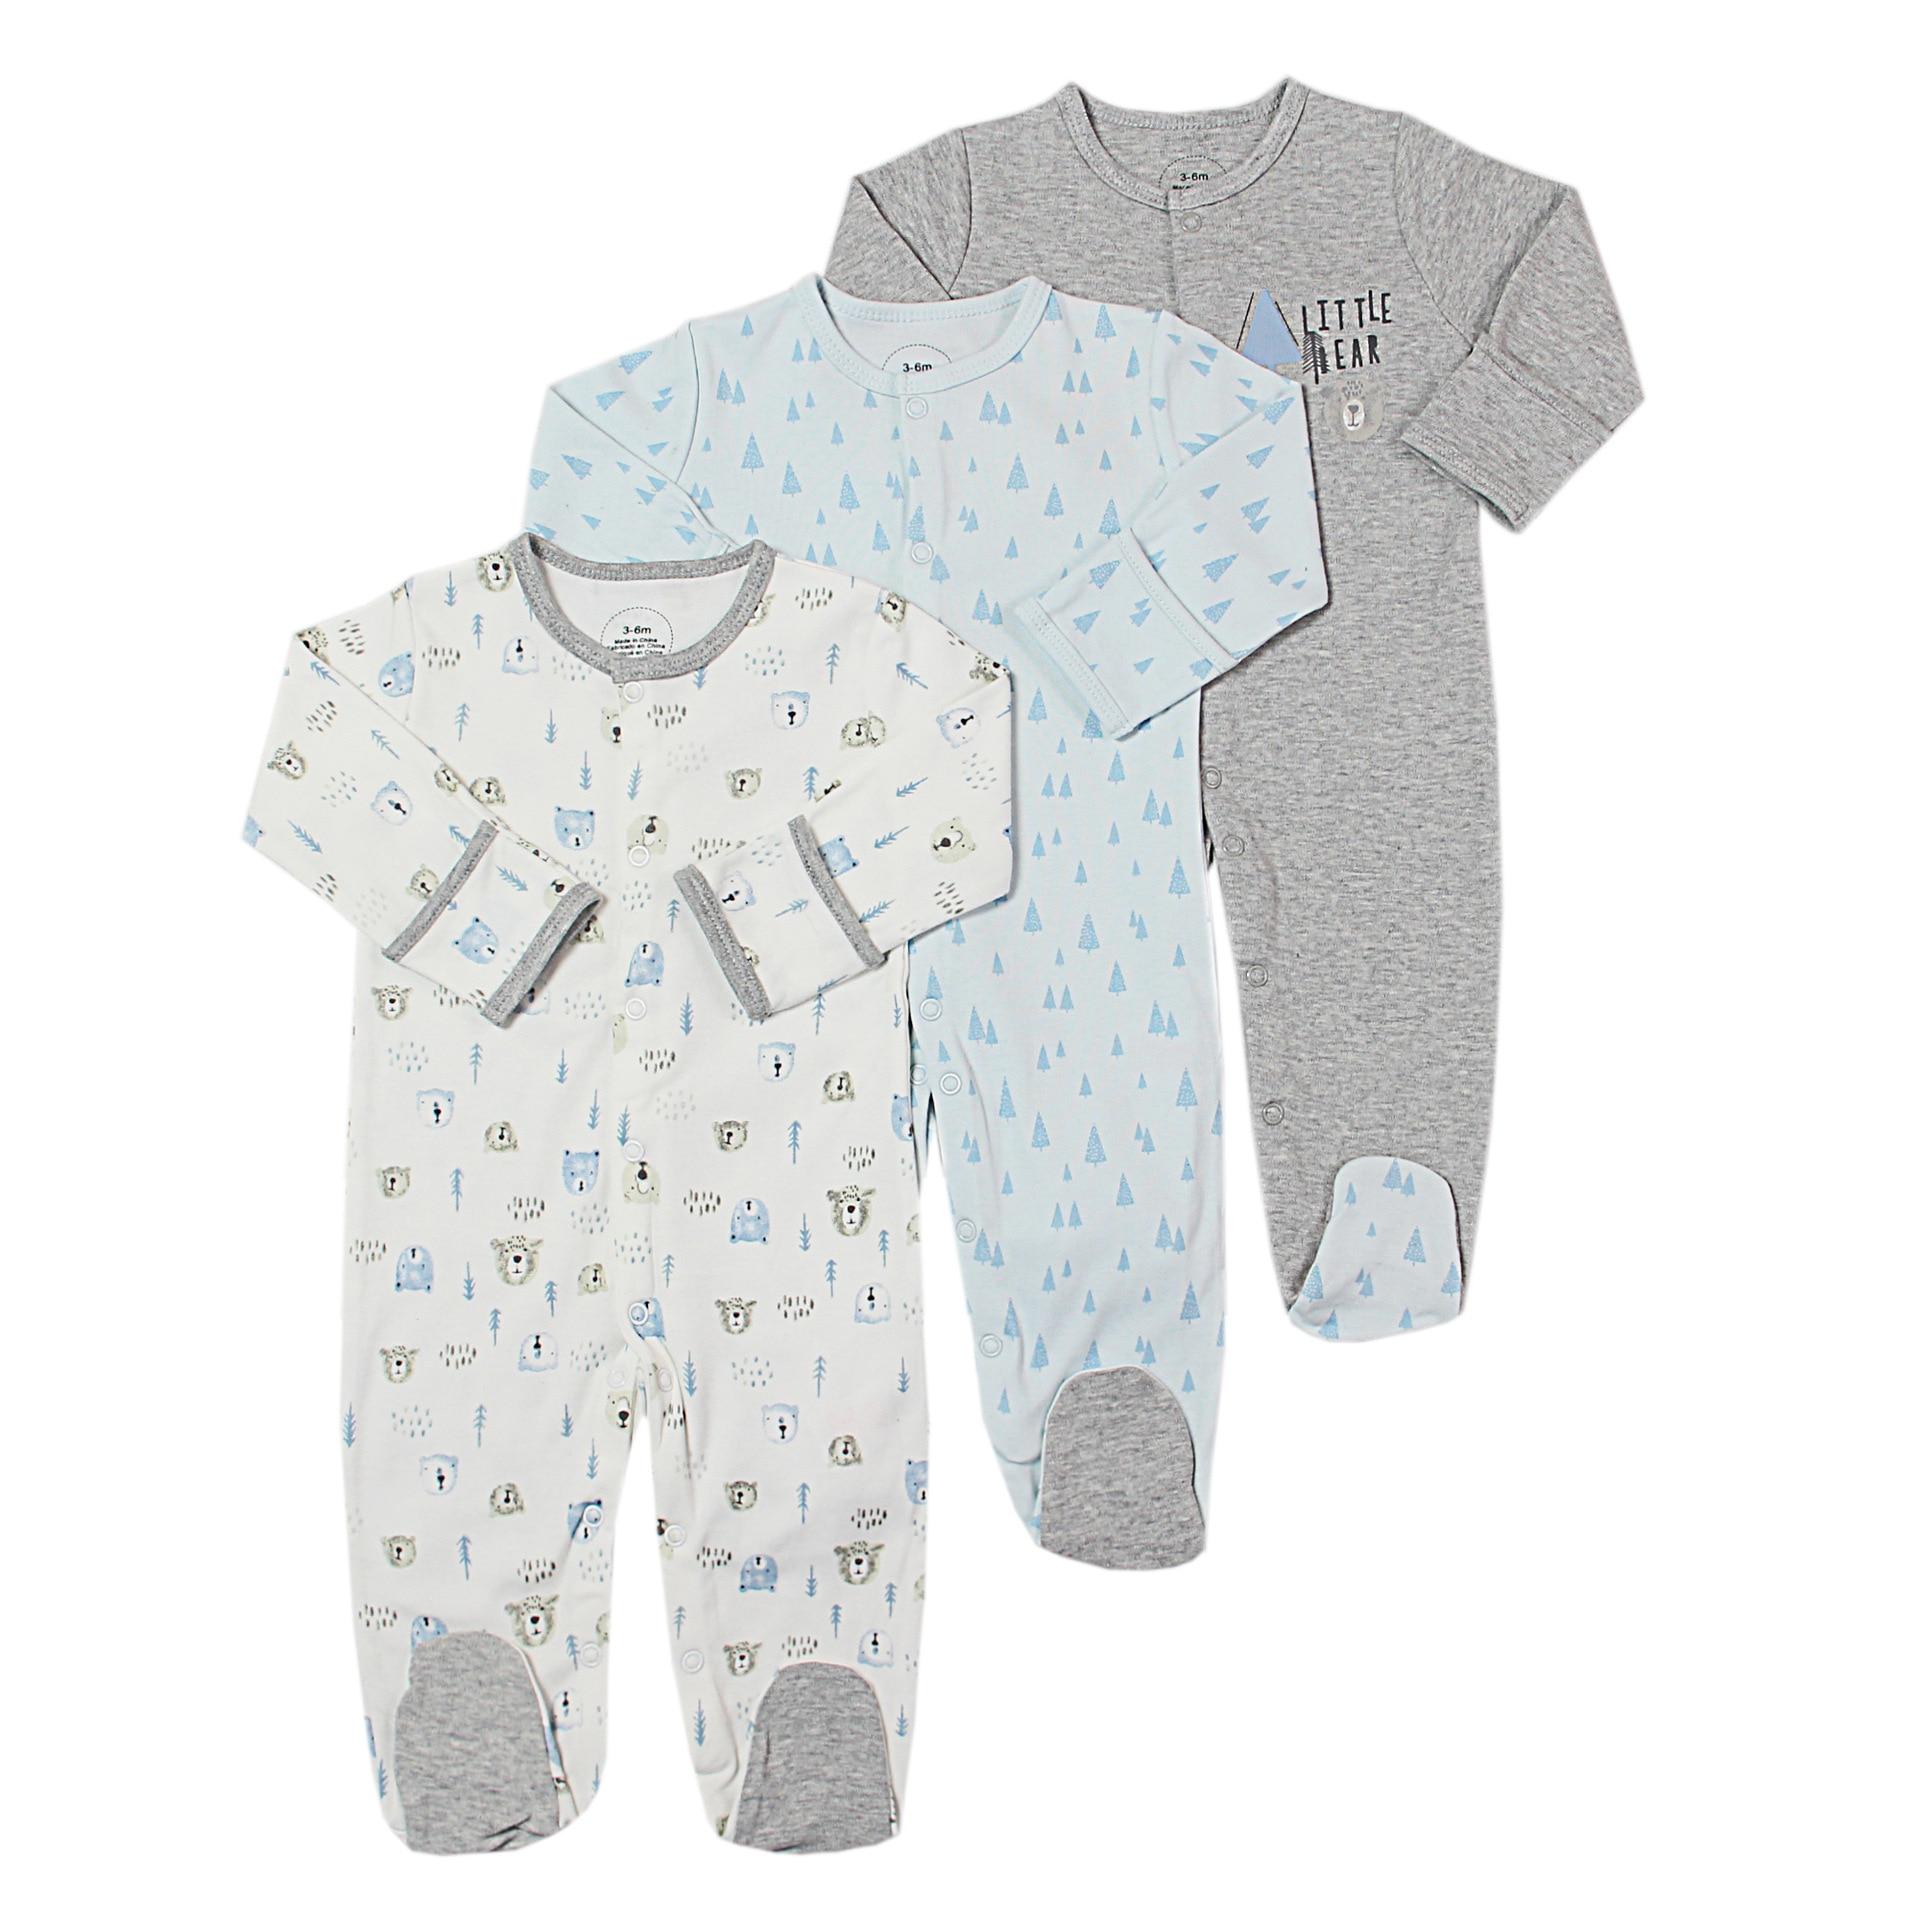 Baby Girls Romper Newborn Jumpsuit Long Sleeve Bodysuit Cotton Sleepsuits 3-6 Months